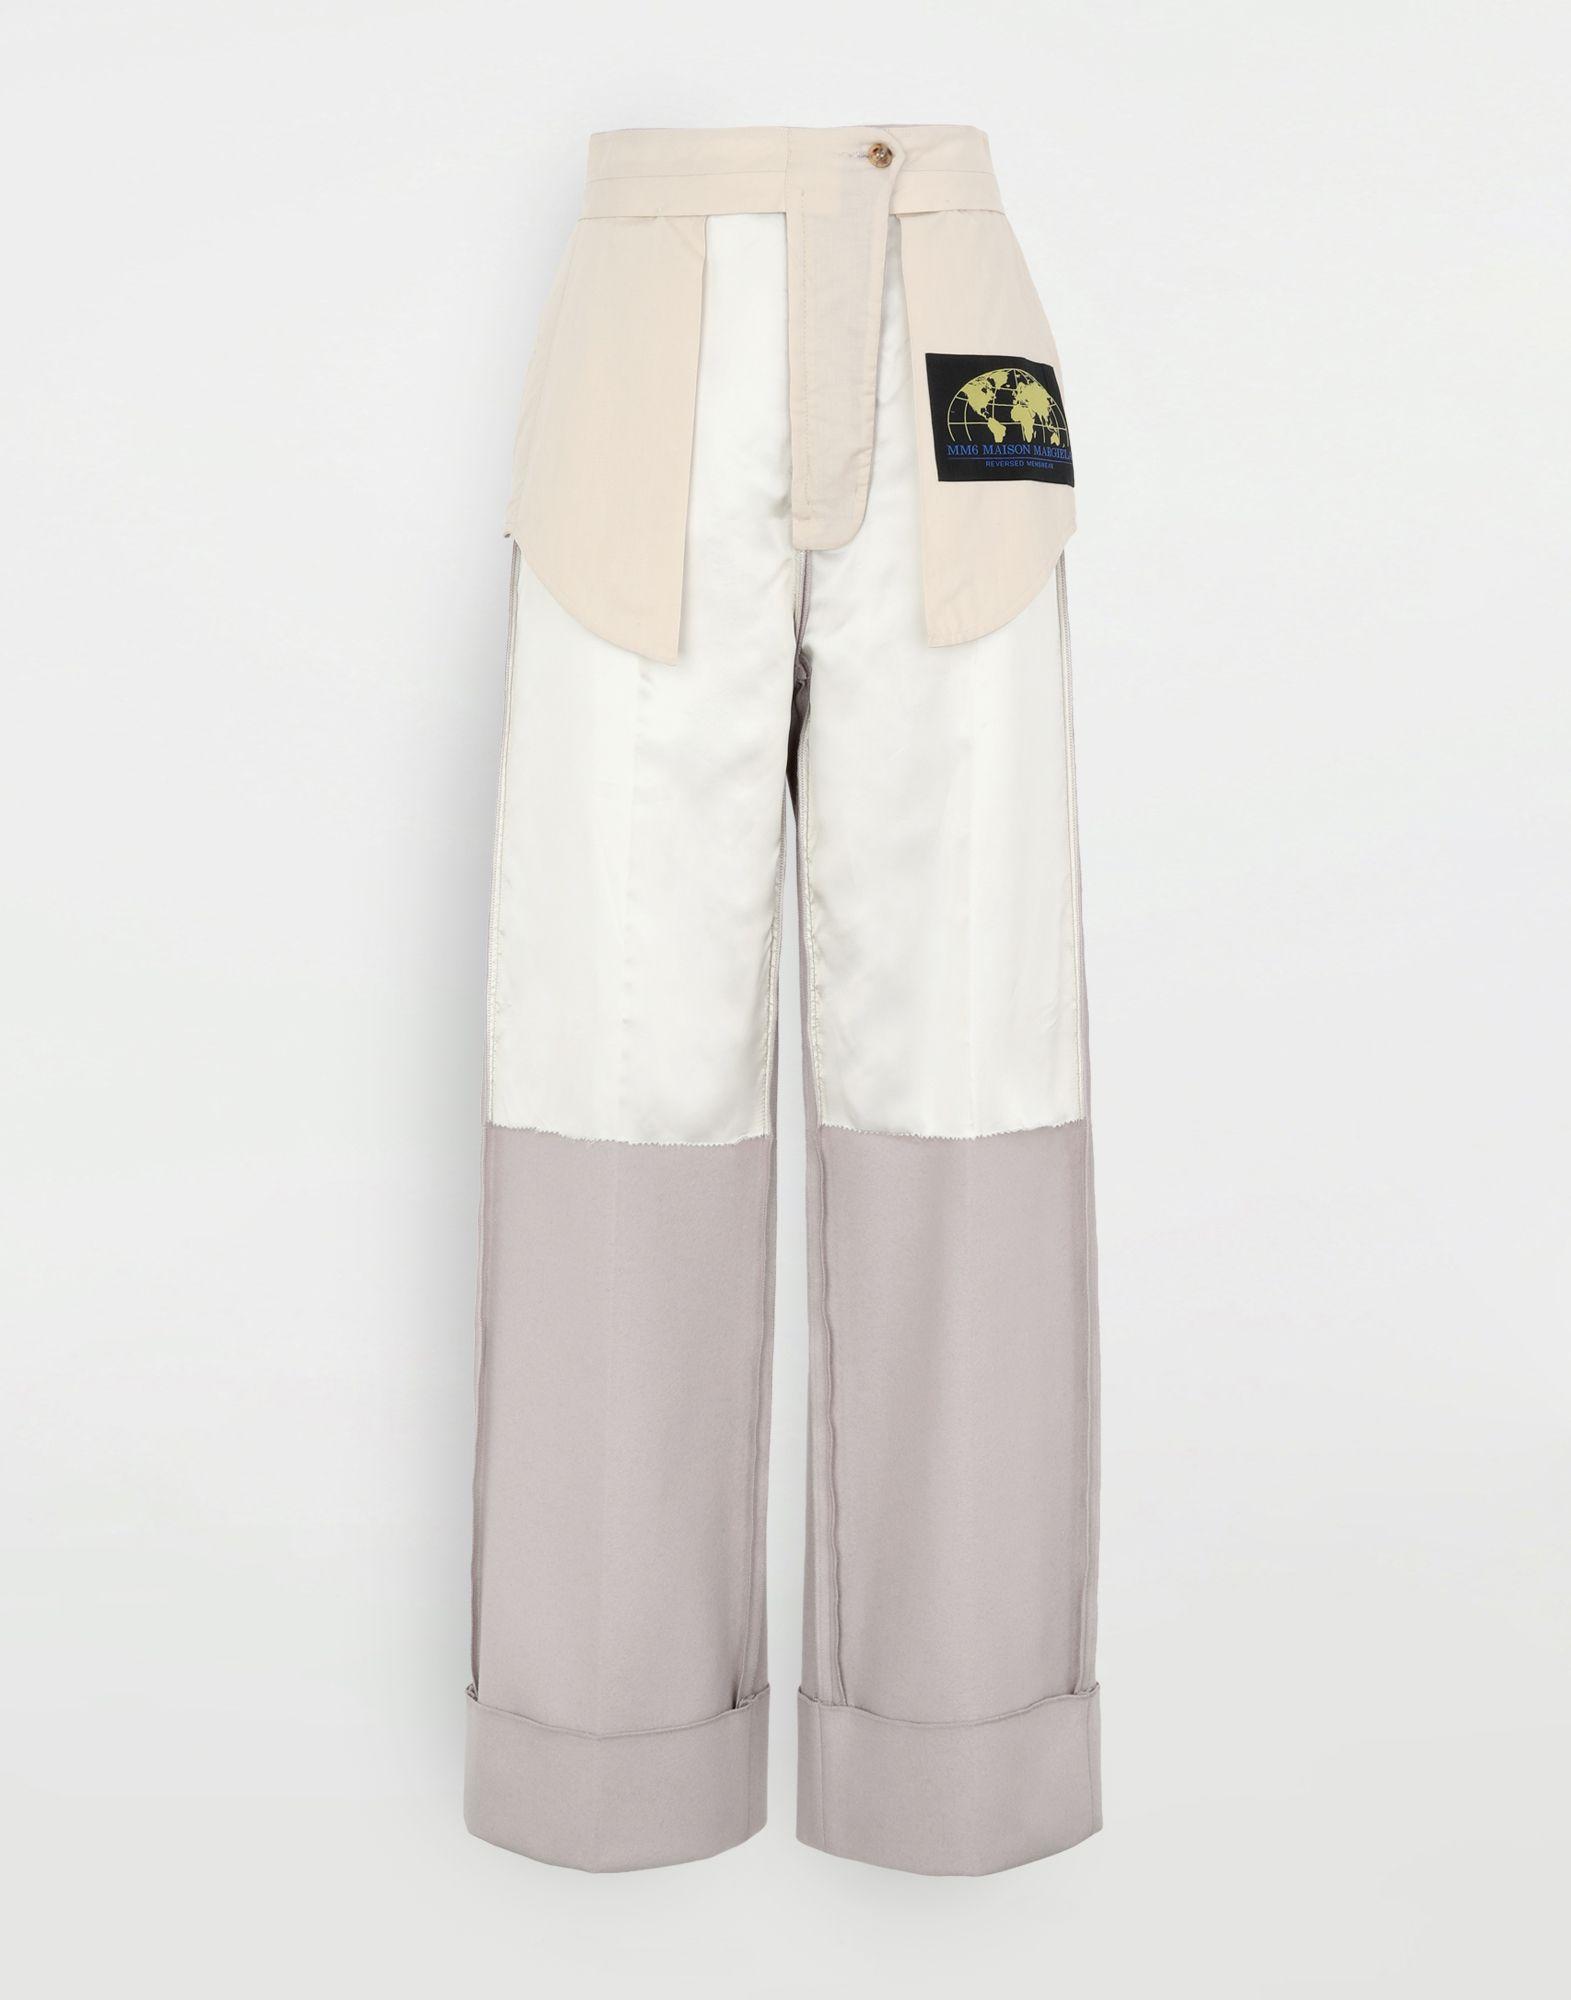 MM6 MAISON MARGIELA Pantaloni sartoriali Reversed Pantalone Donna f